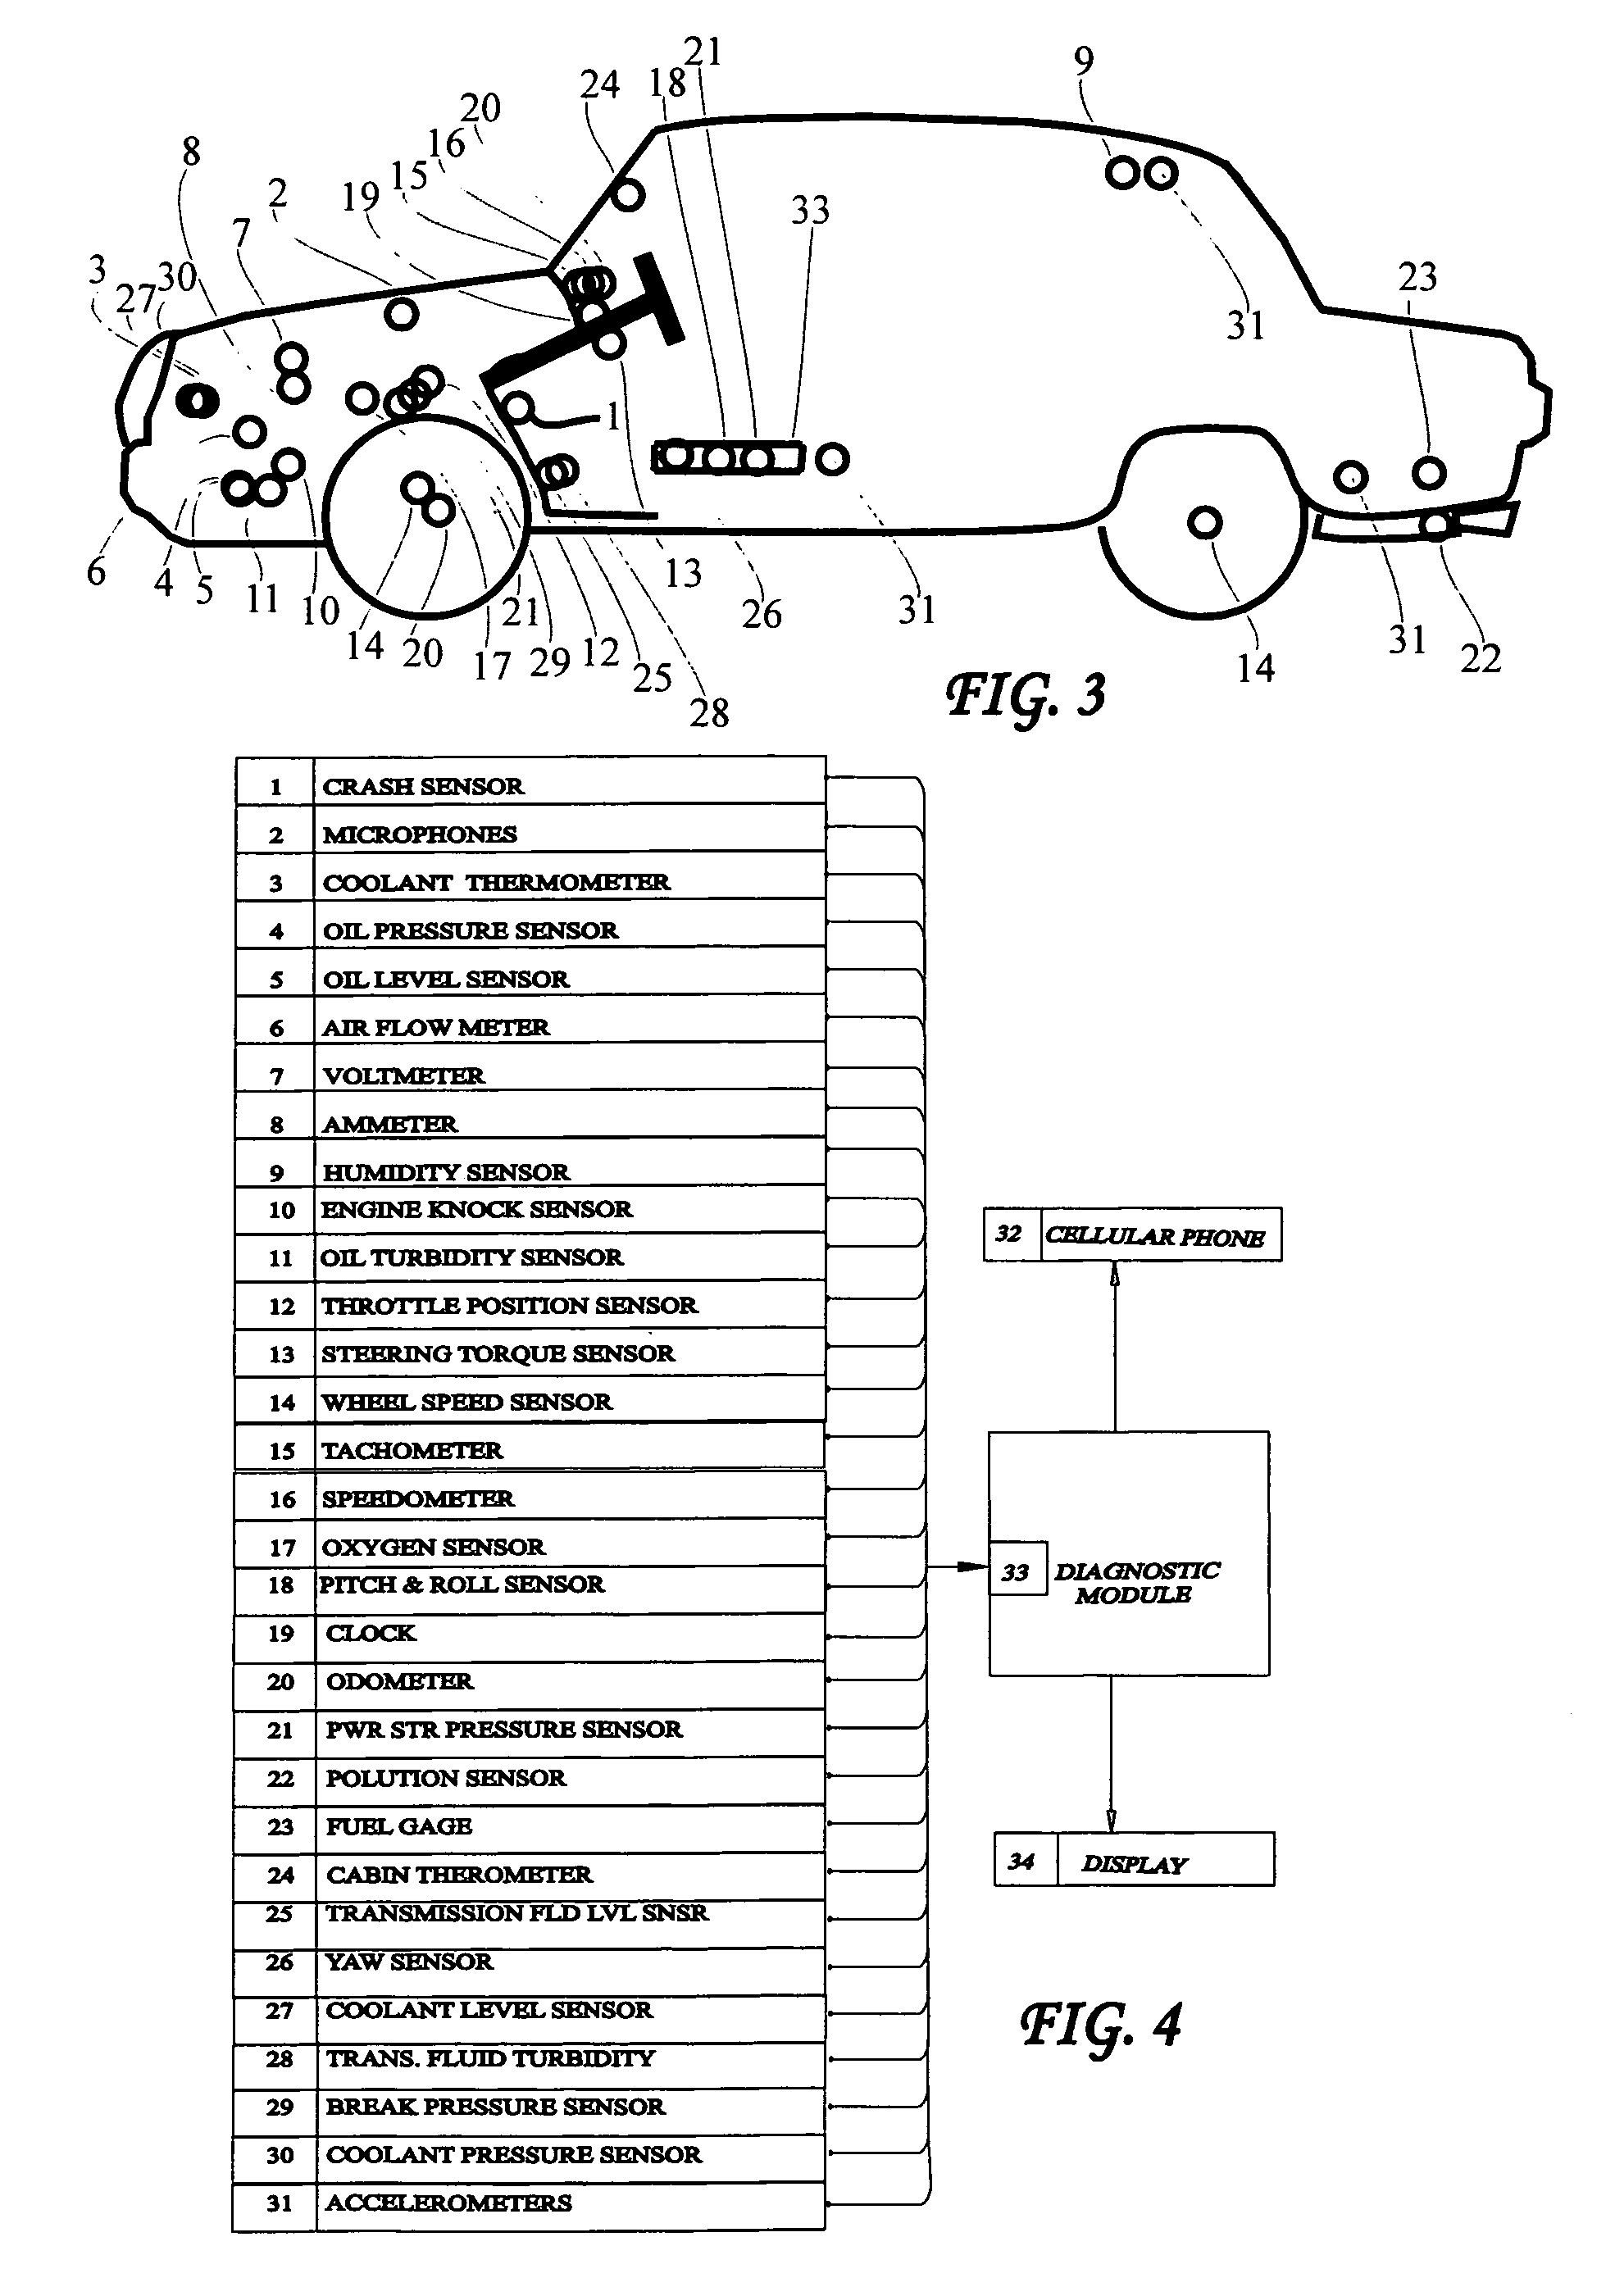 Patent US 7,103,460 B1